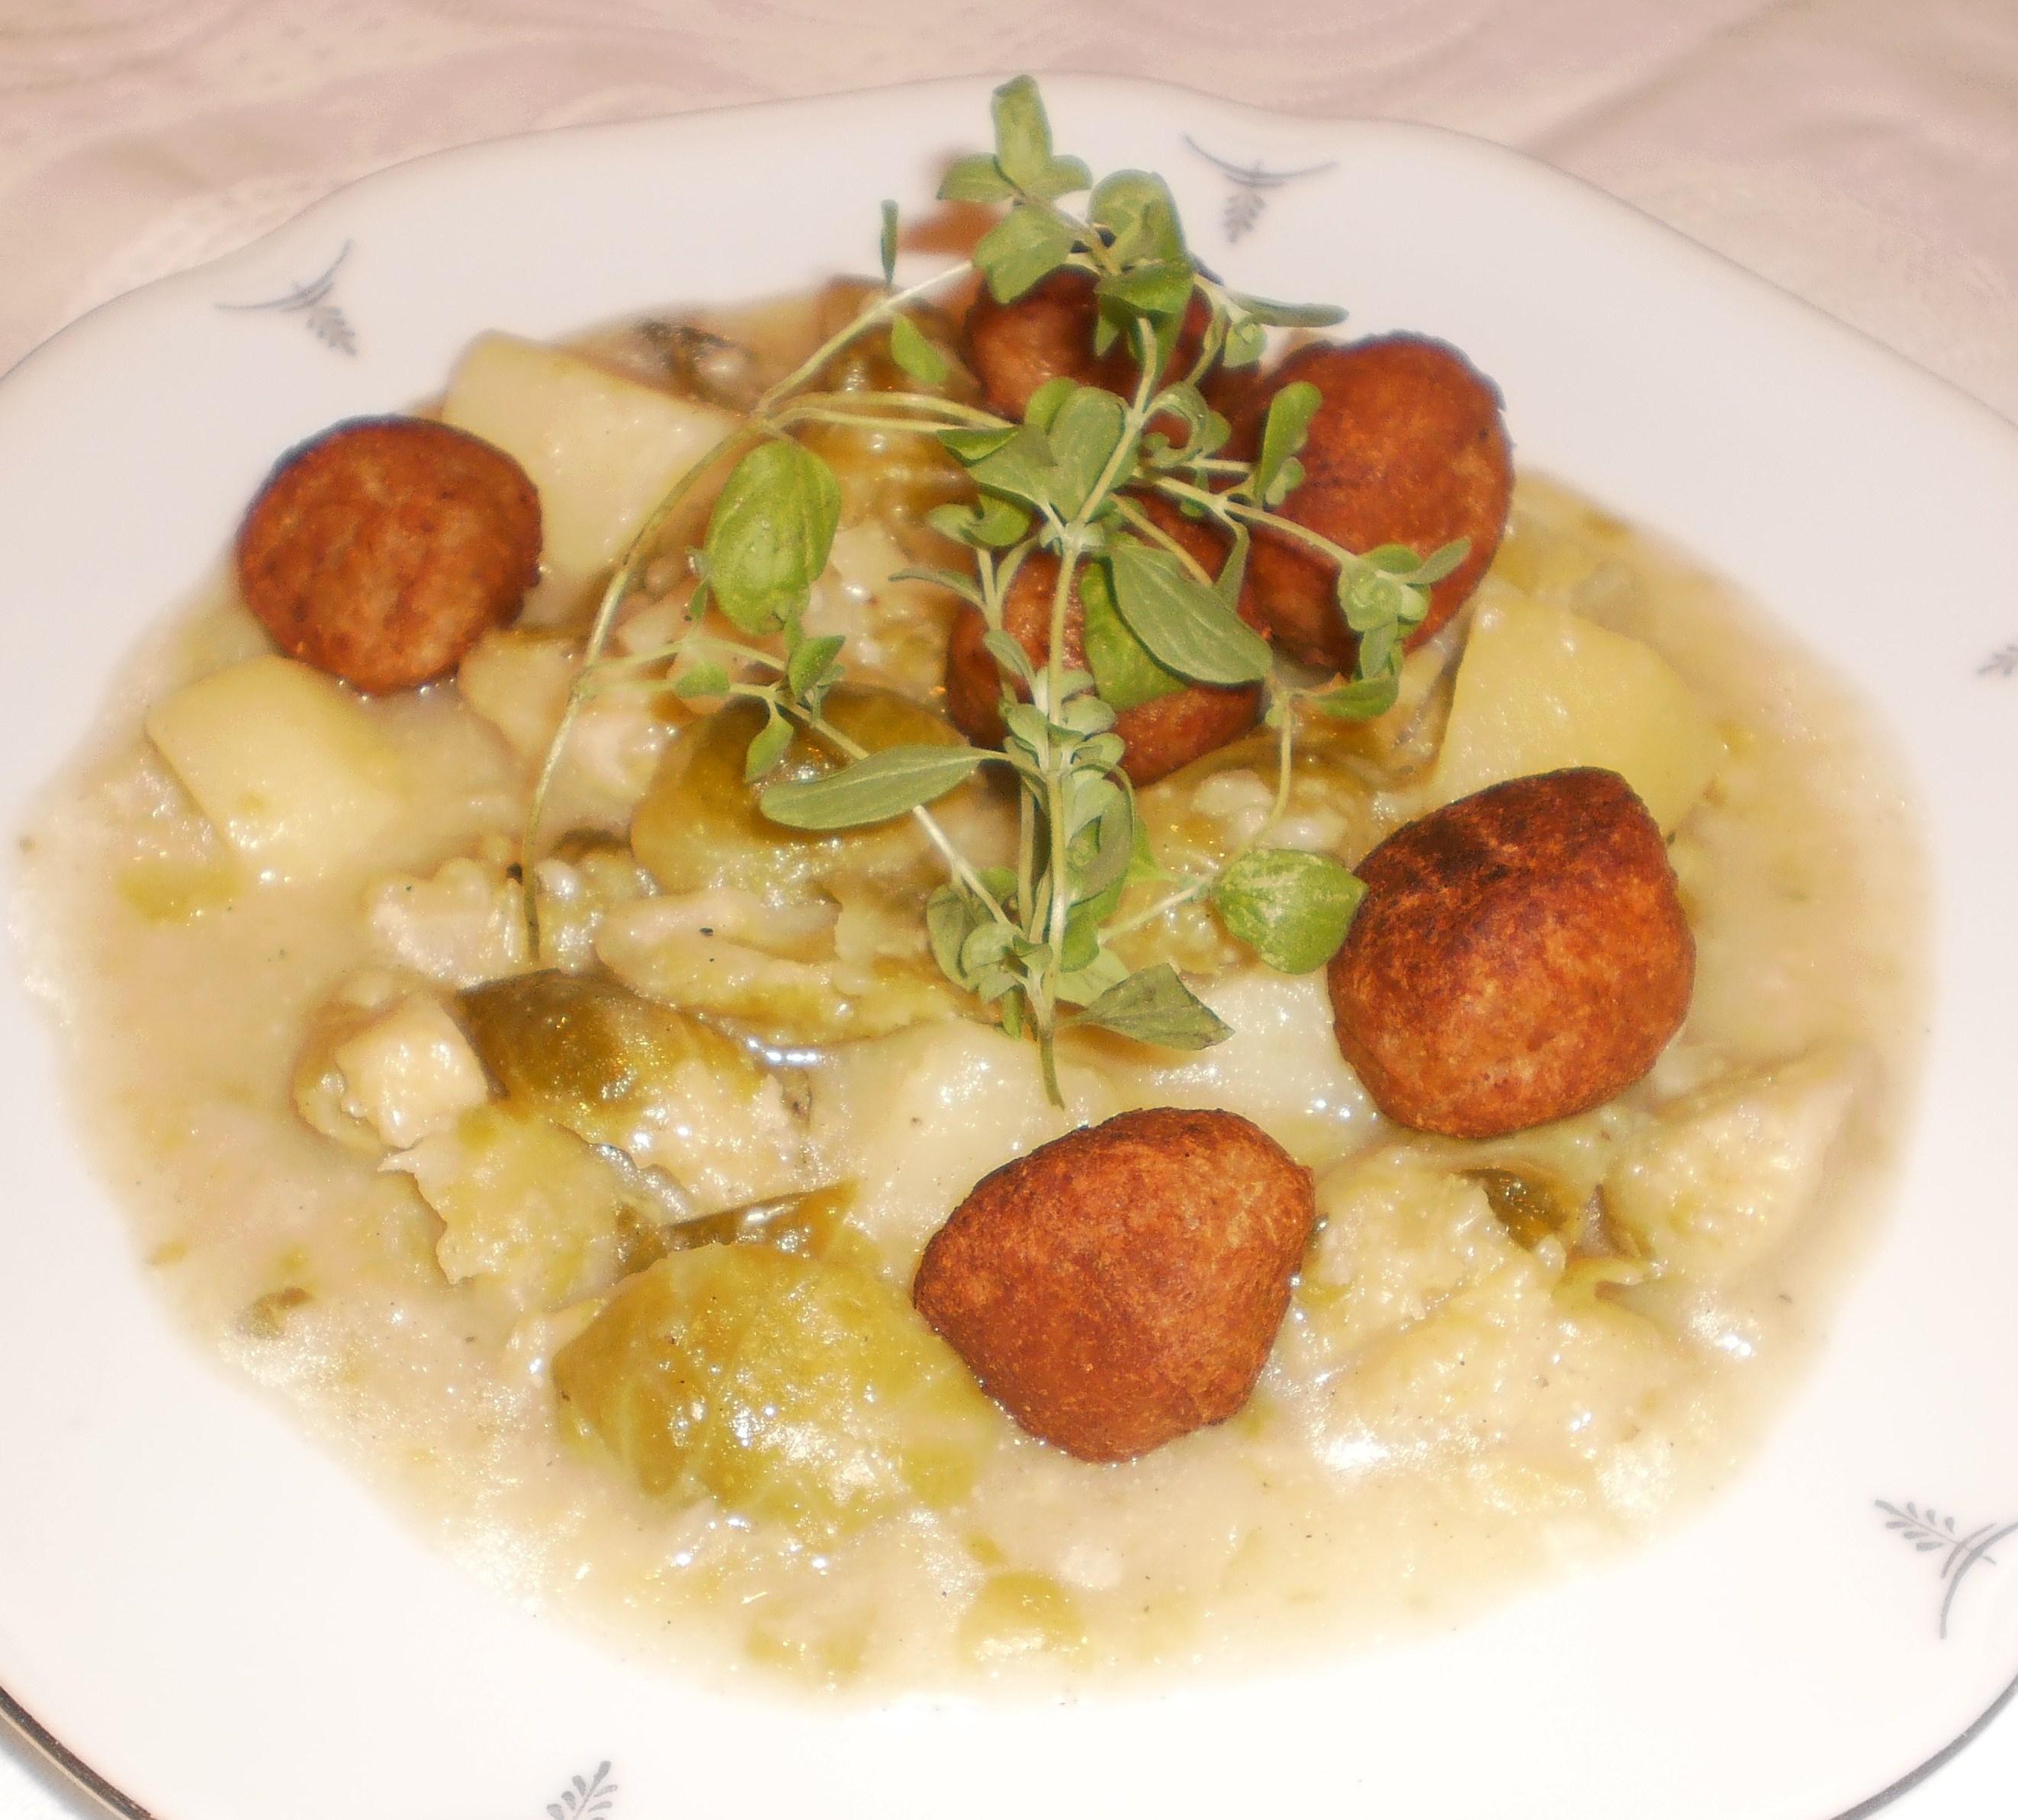 Gryta med brysselkål och potatis - Kelbimbófözelék